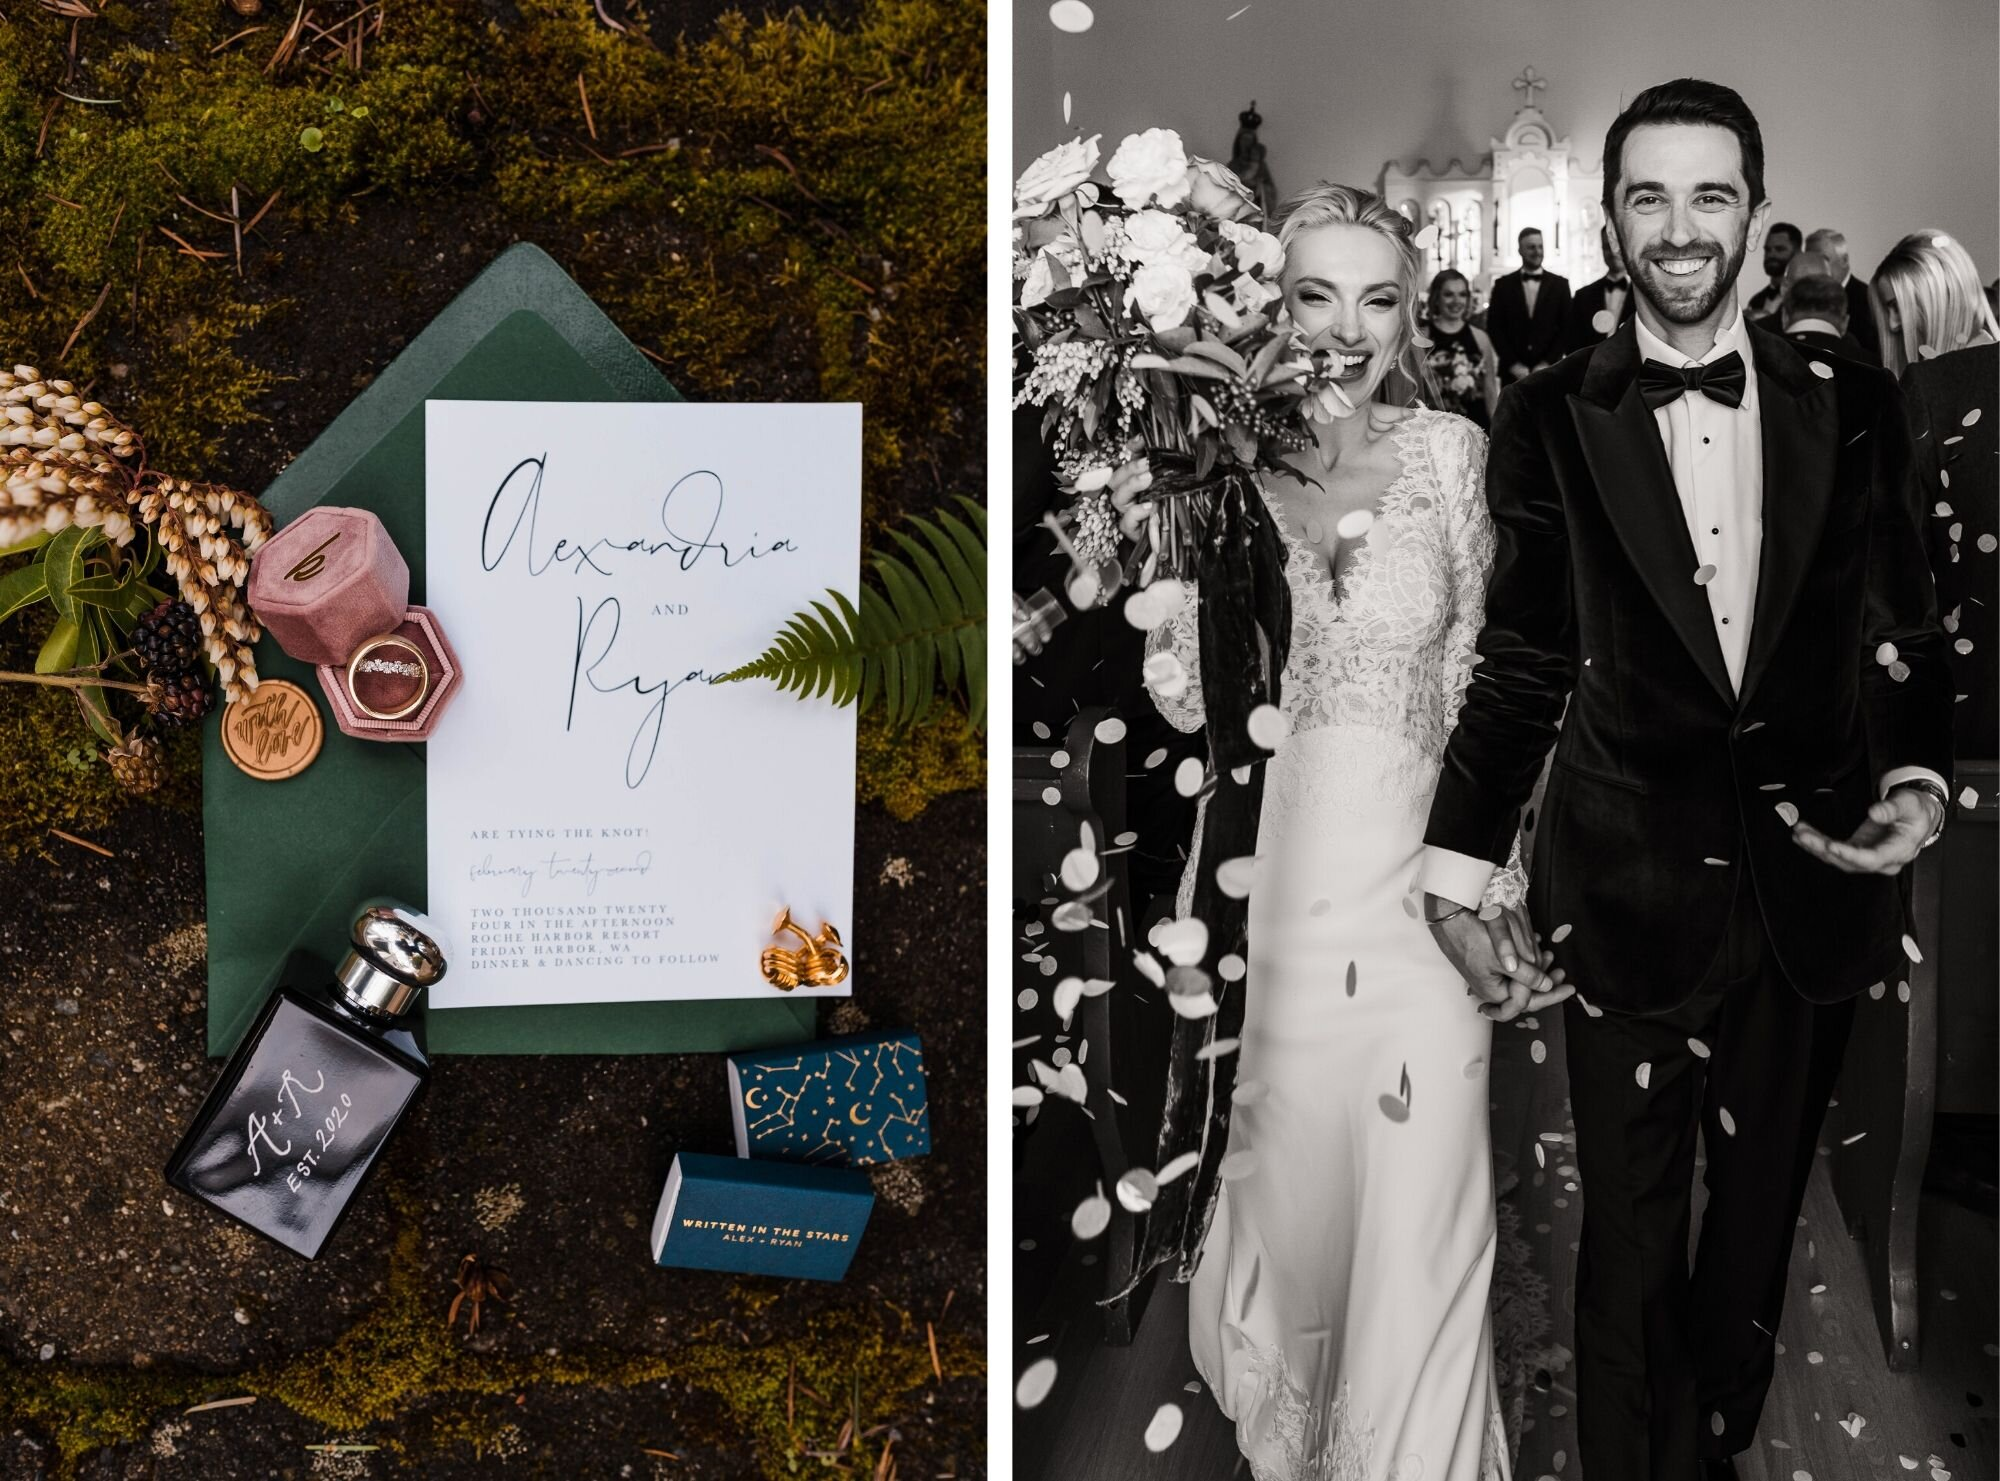 How to get married during coronavirus [Creative Ideas] — Between